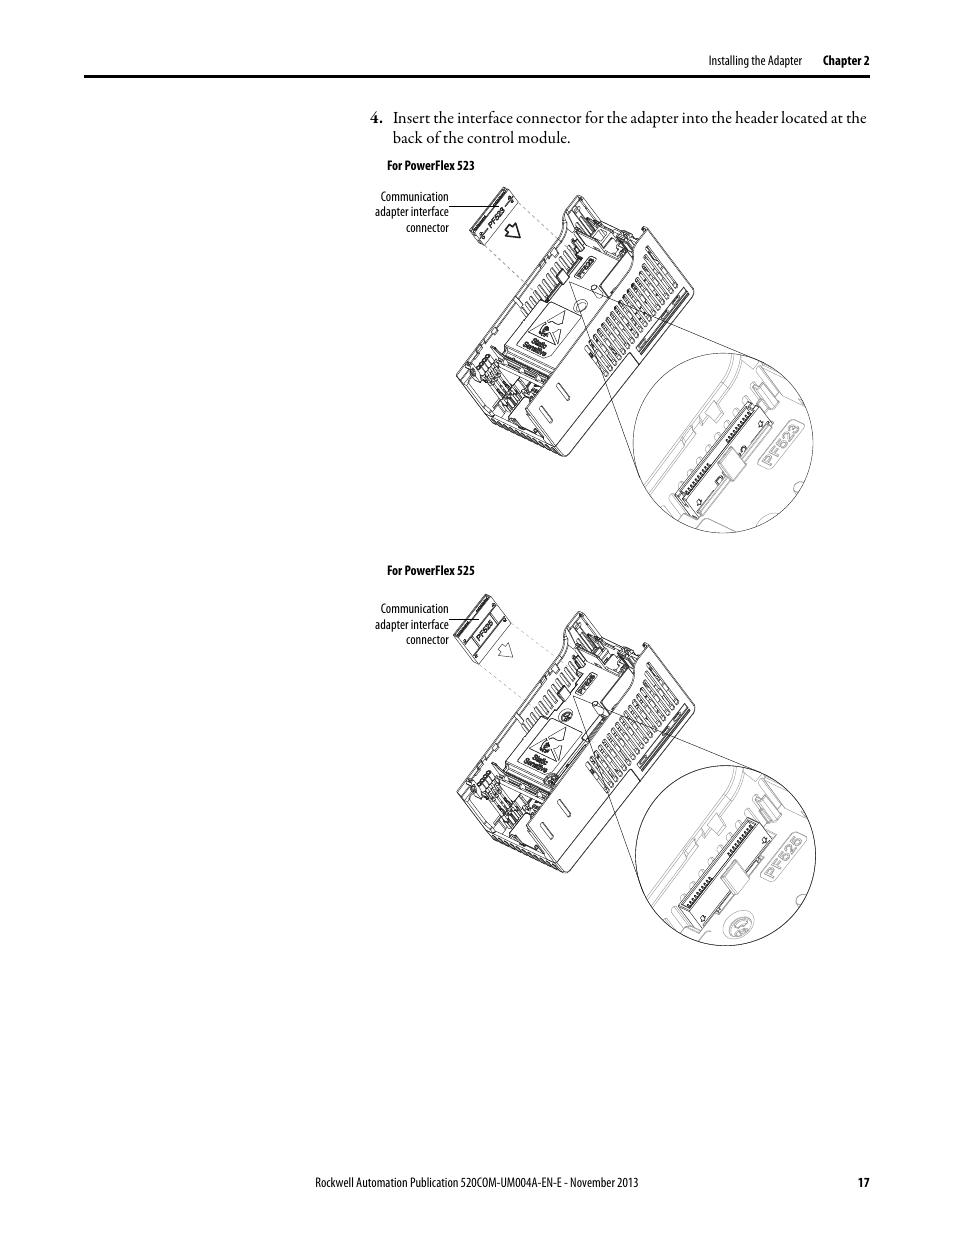 Rockwell Automation 25-COMM-P PowerFlex PROFIBUS DPV1